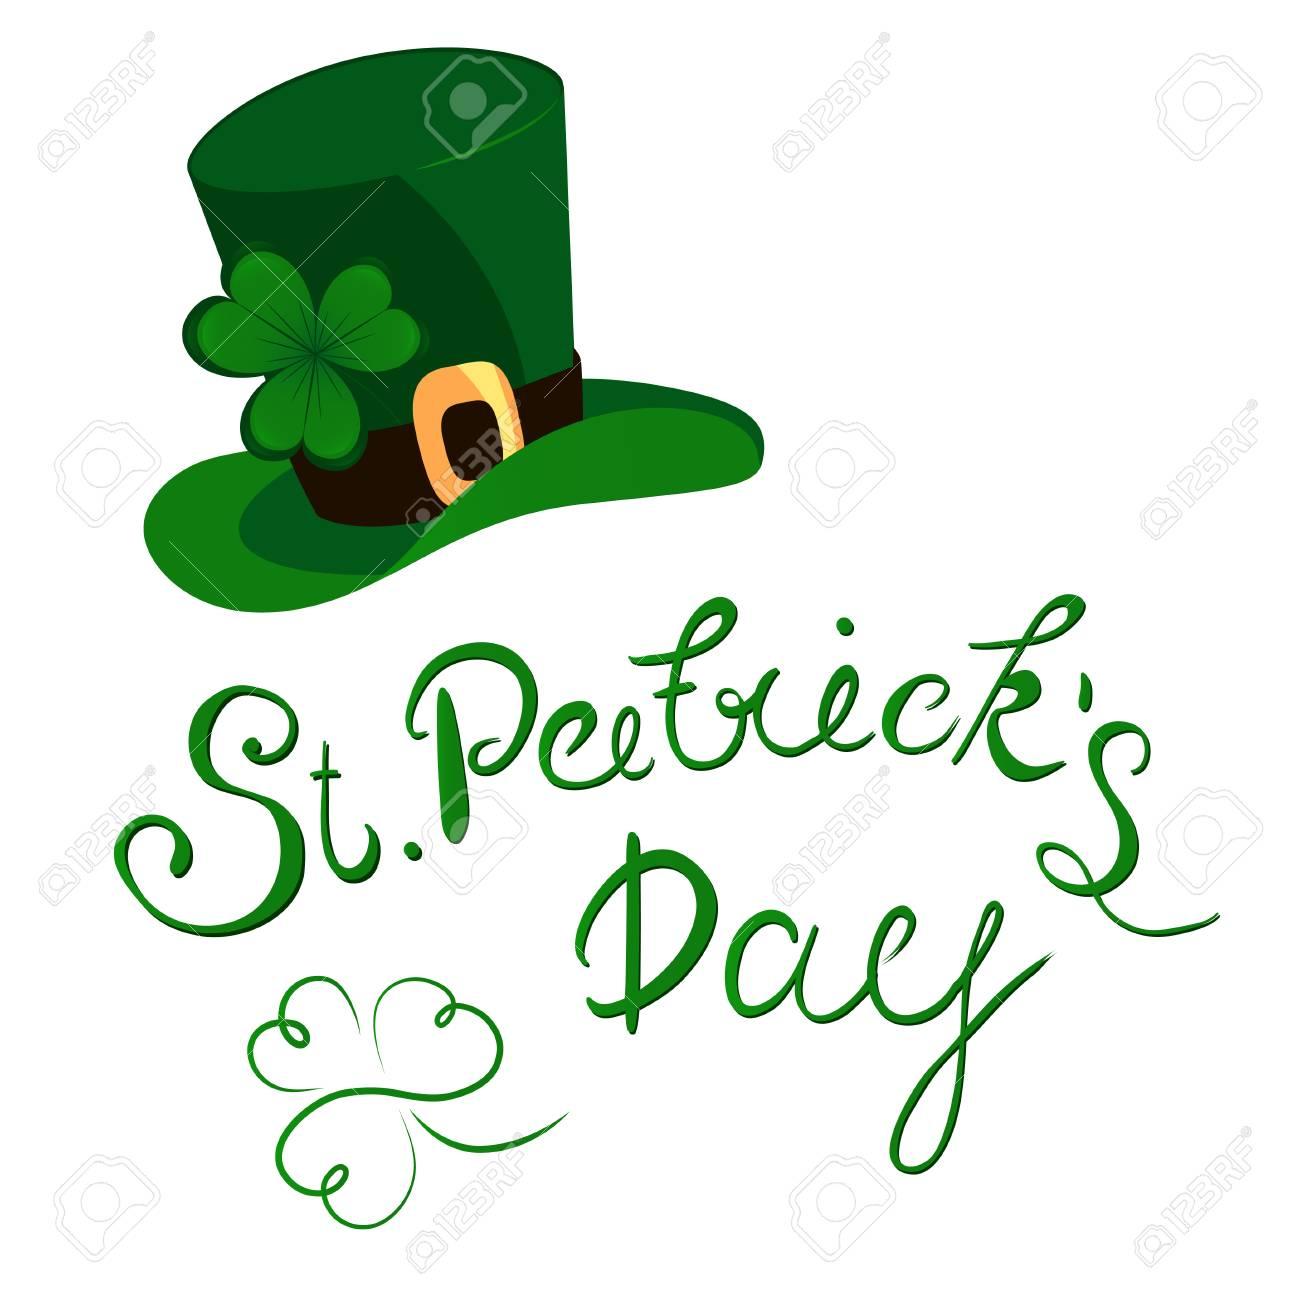 Großartig Shamrock Malvorlagen St. Patricks Day Ideen - Entry Level ...